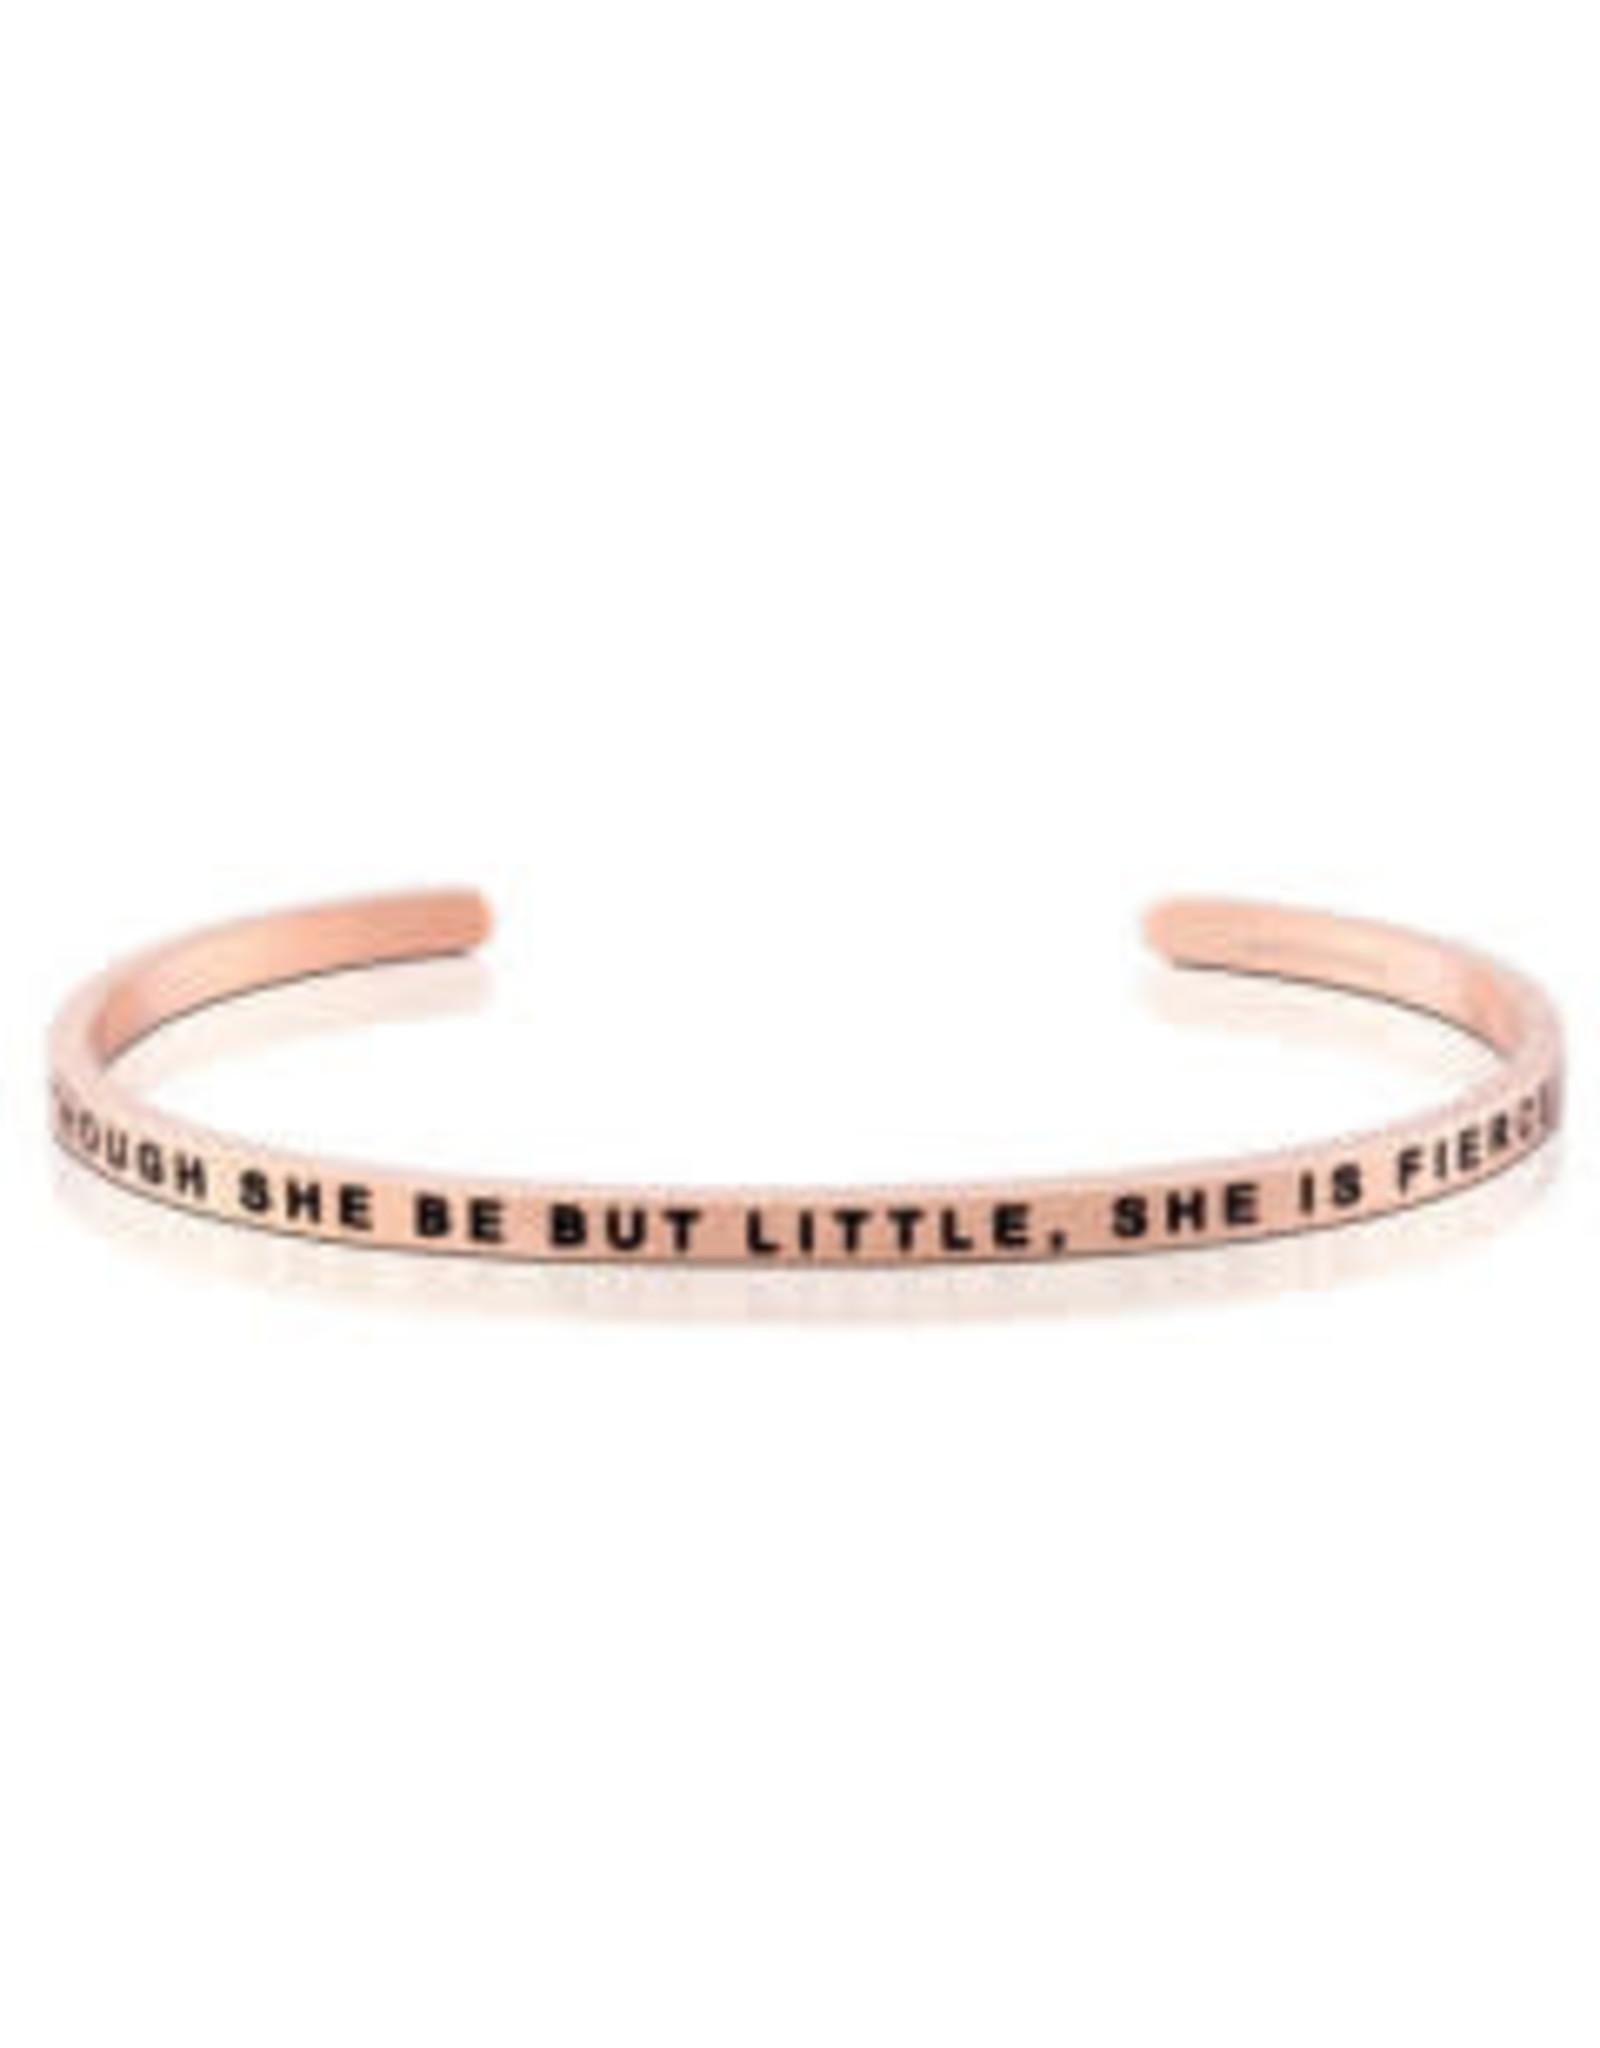 MantraBand MantraBand Bracelet, Though She Be But Little She Is Fierce